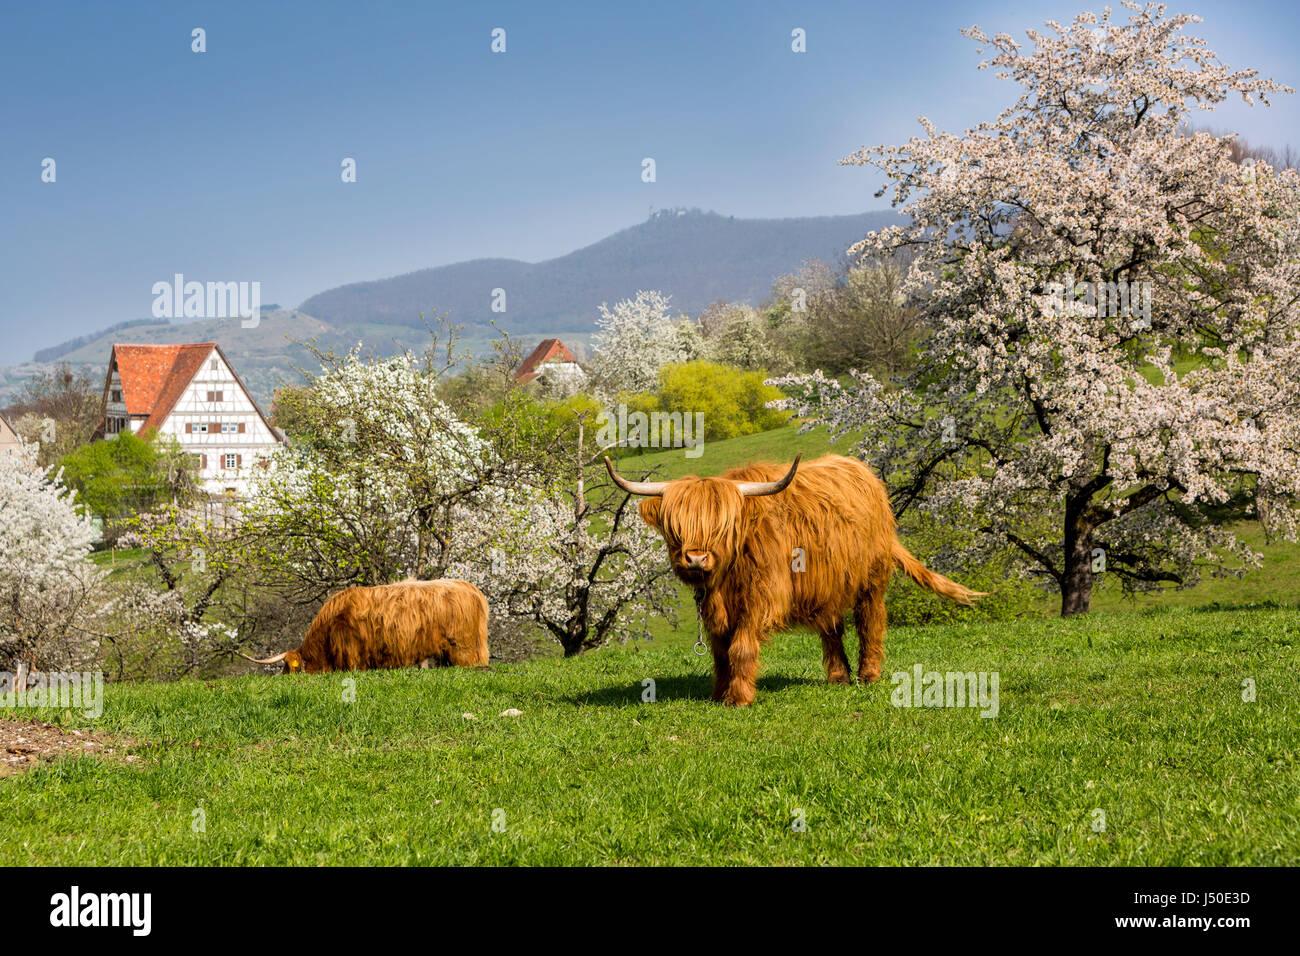 Scottish highland cattle,pasture near the Freilichtmuseum Beuren. - Stock Image